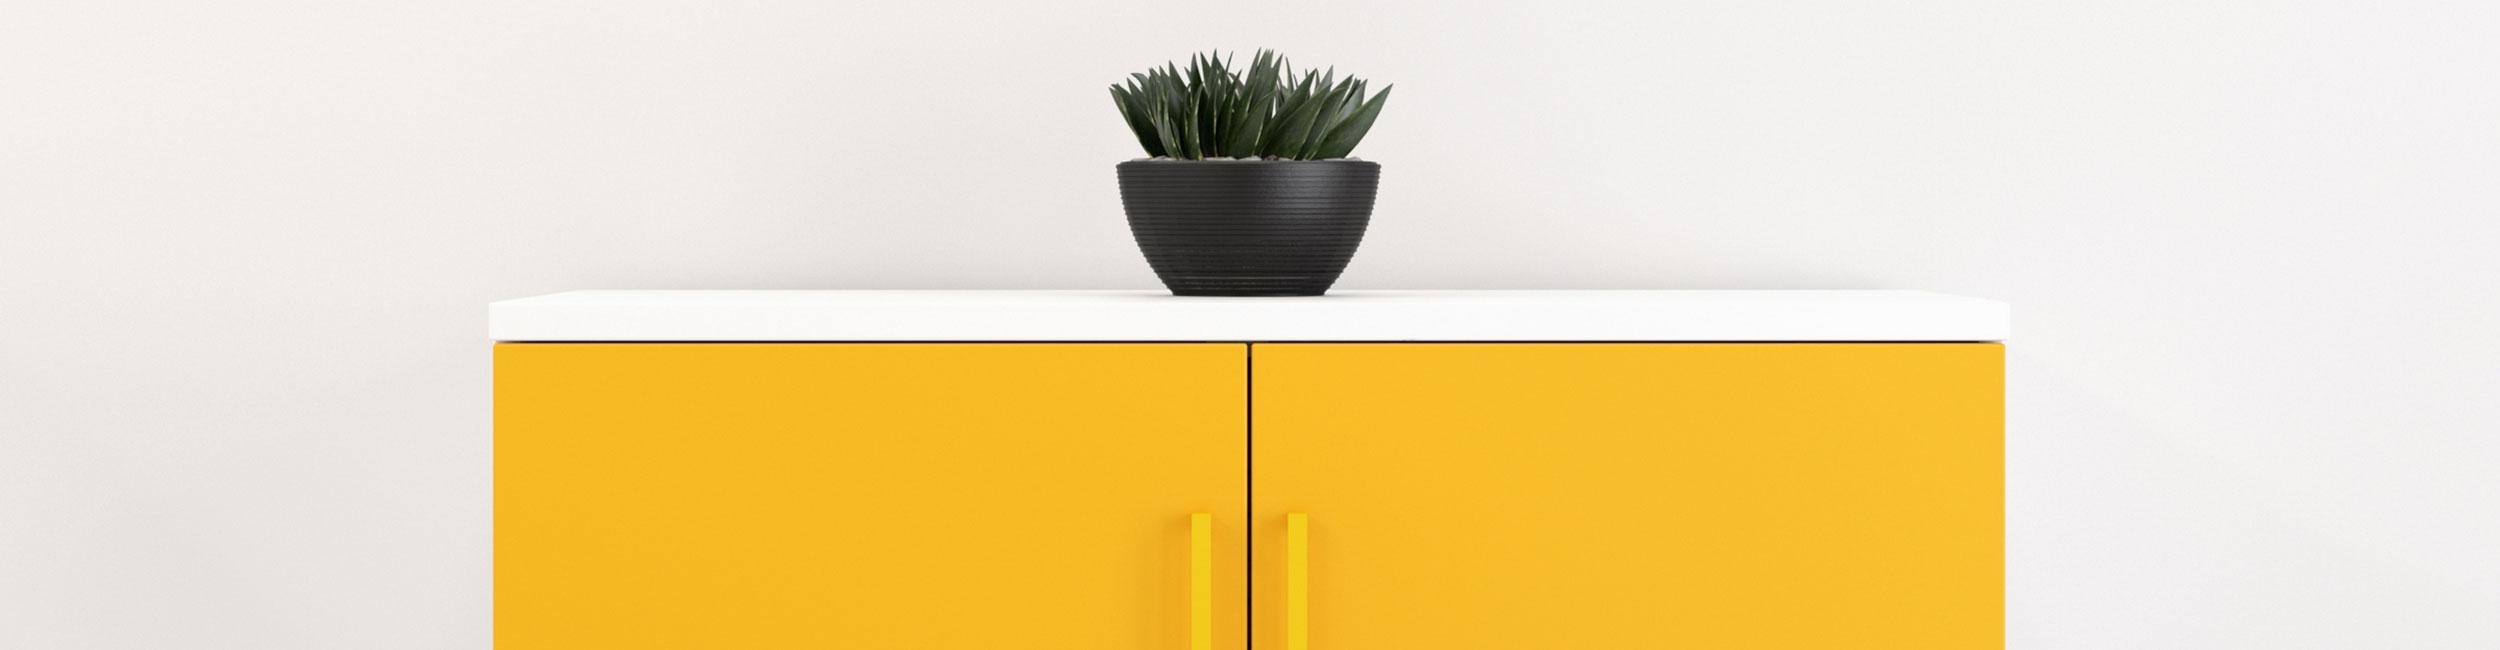 Introducing 'Flare' - Enaflo Interiors